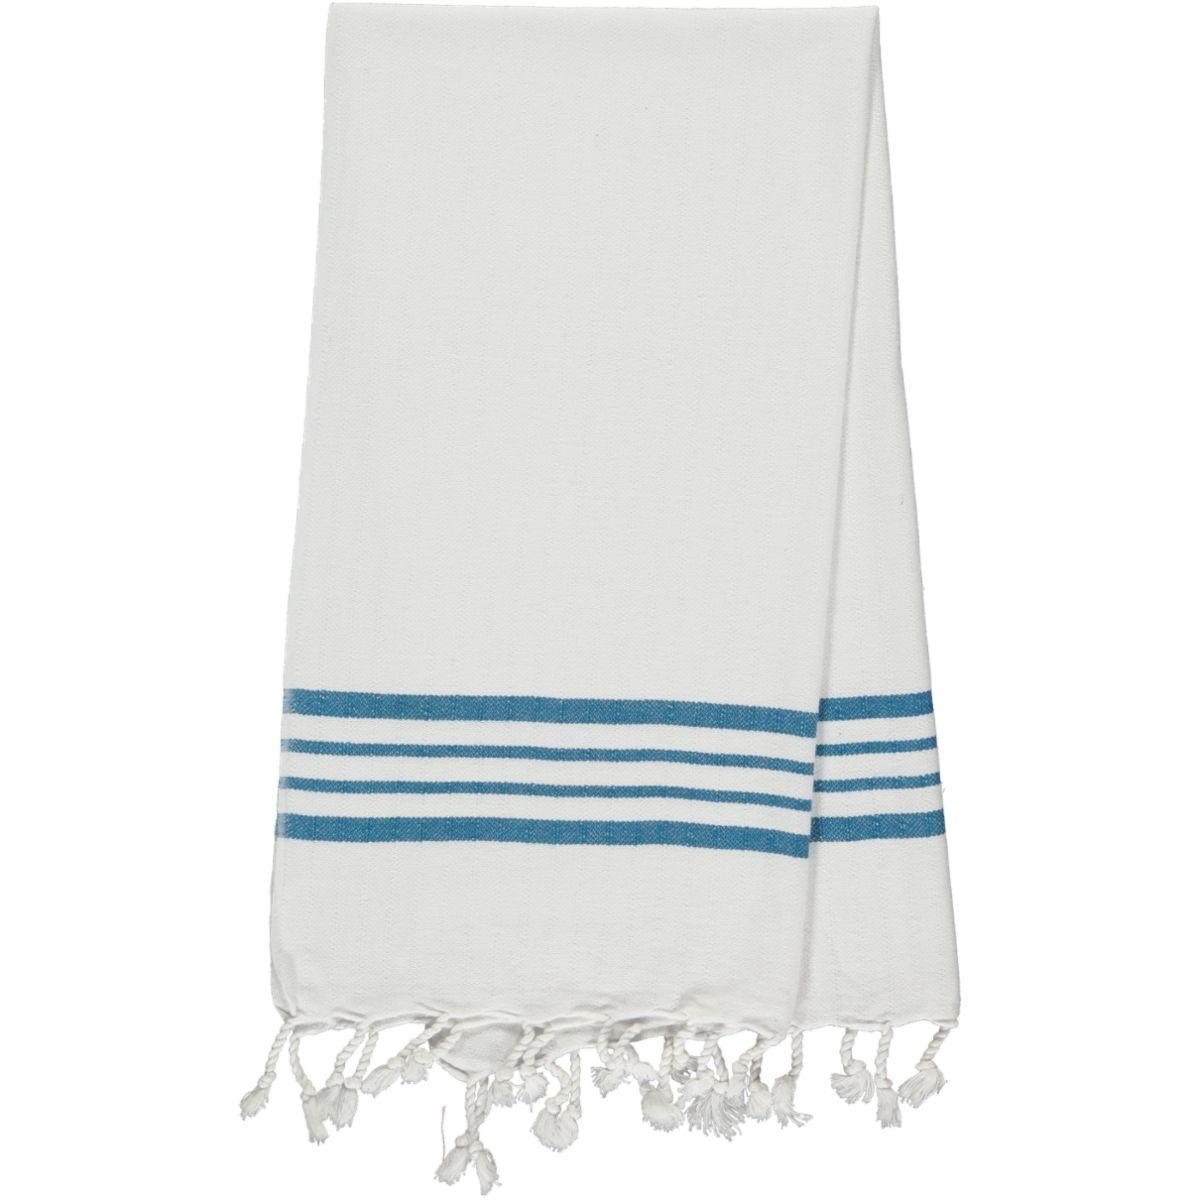 Peshkir - White Sultan / Petrol Blue Stripes